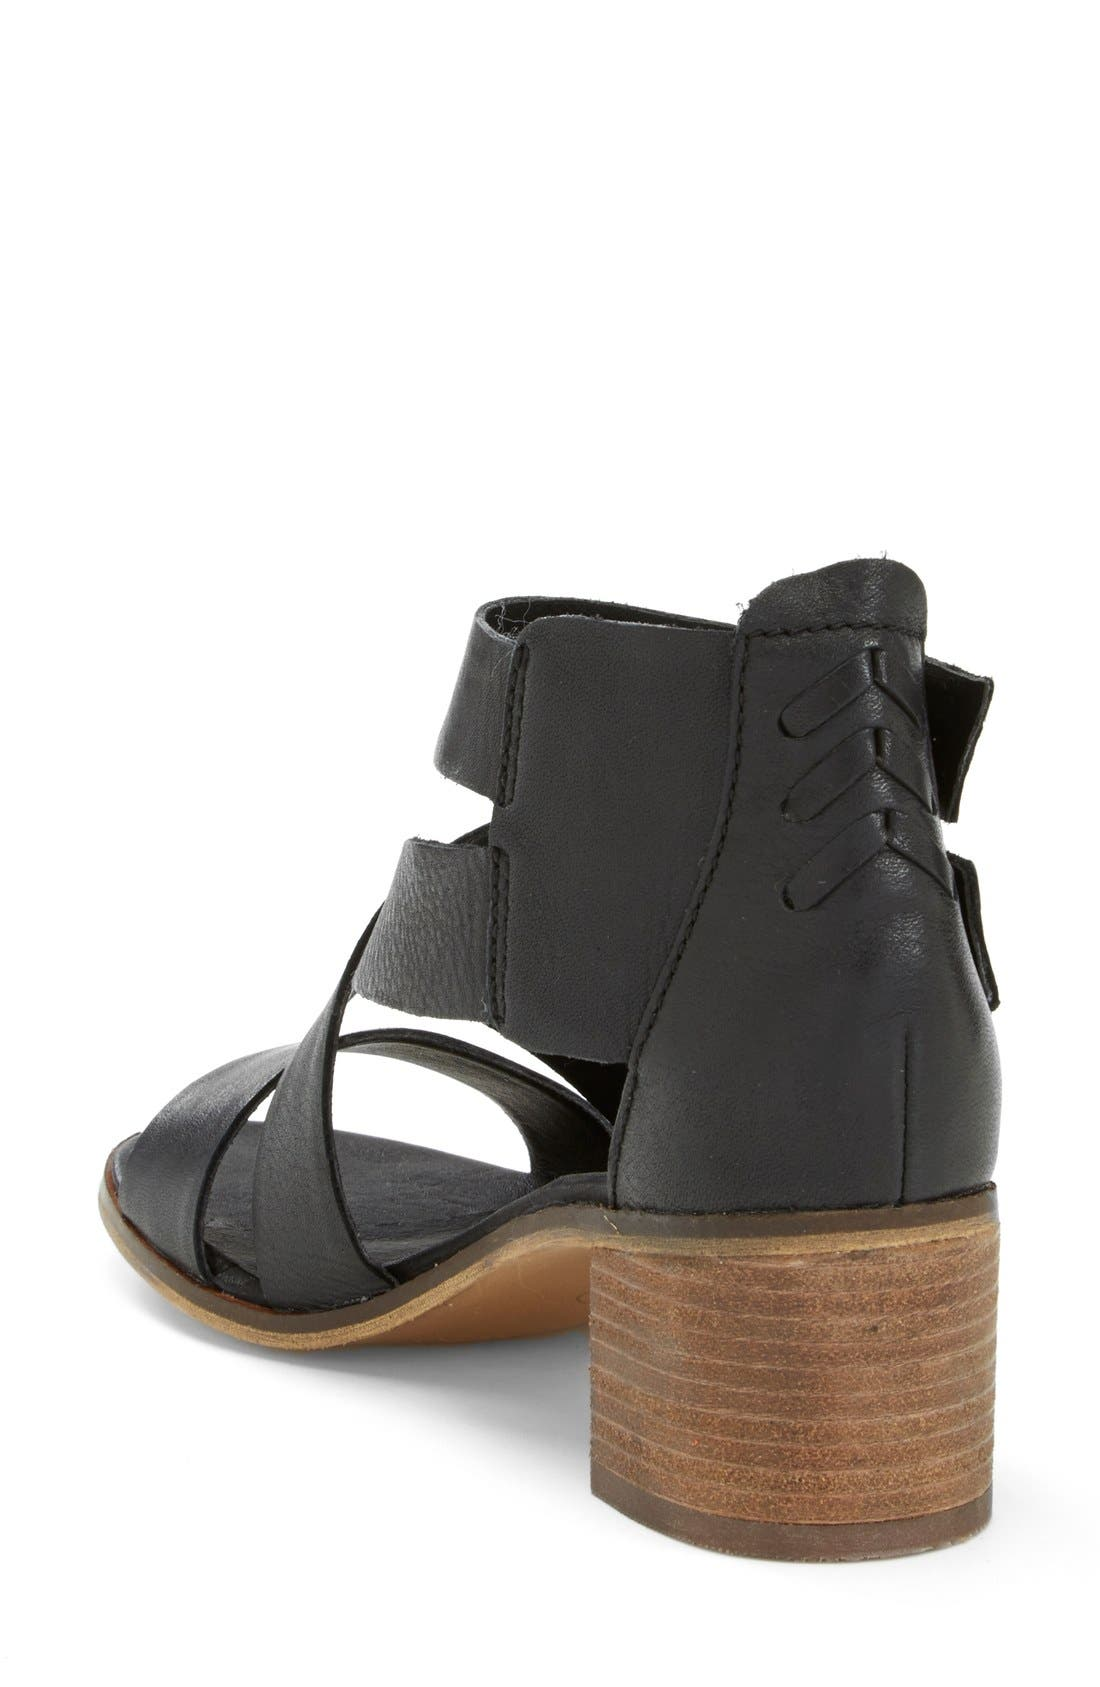 'Rosana' Double Ankle Strap Leather Sandal,                             Alternate thumbnail 3, color,                             001